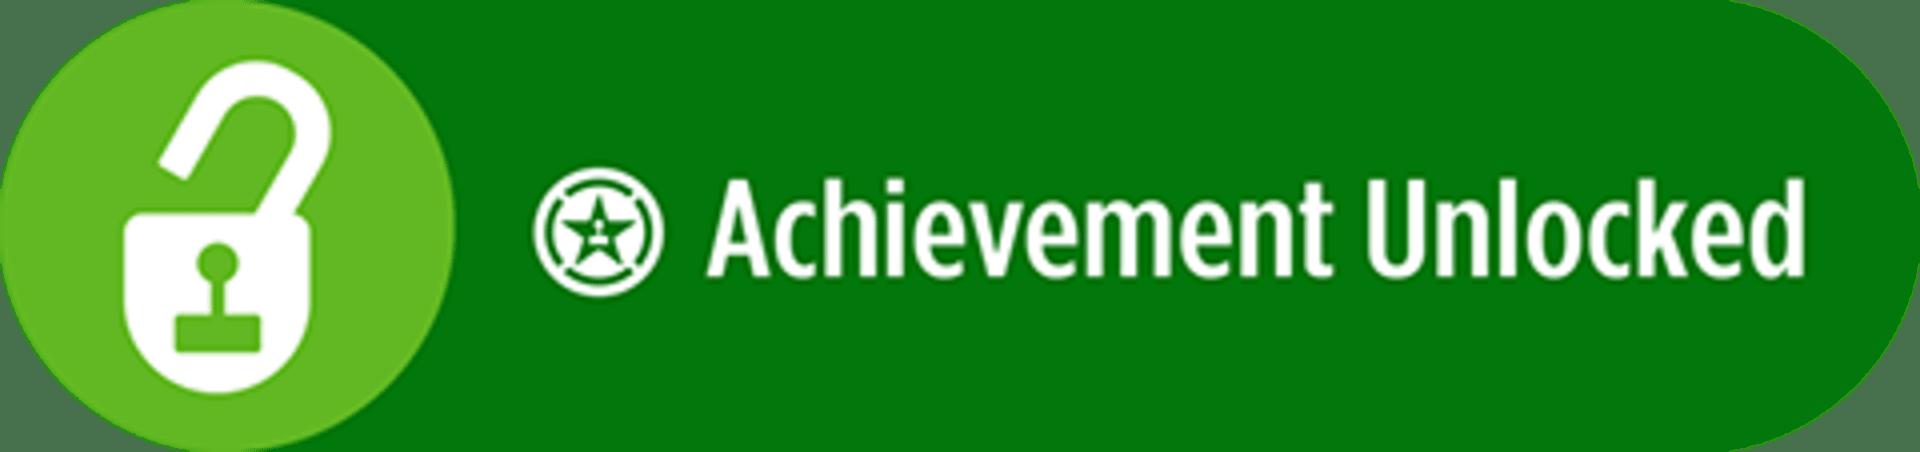 AchievementUnlockedLogo.png